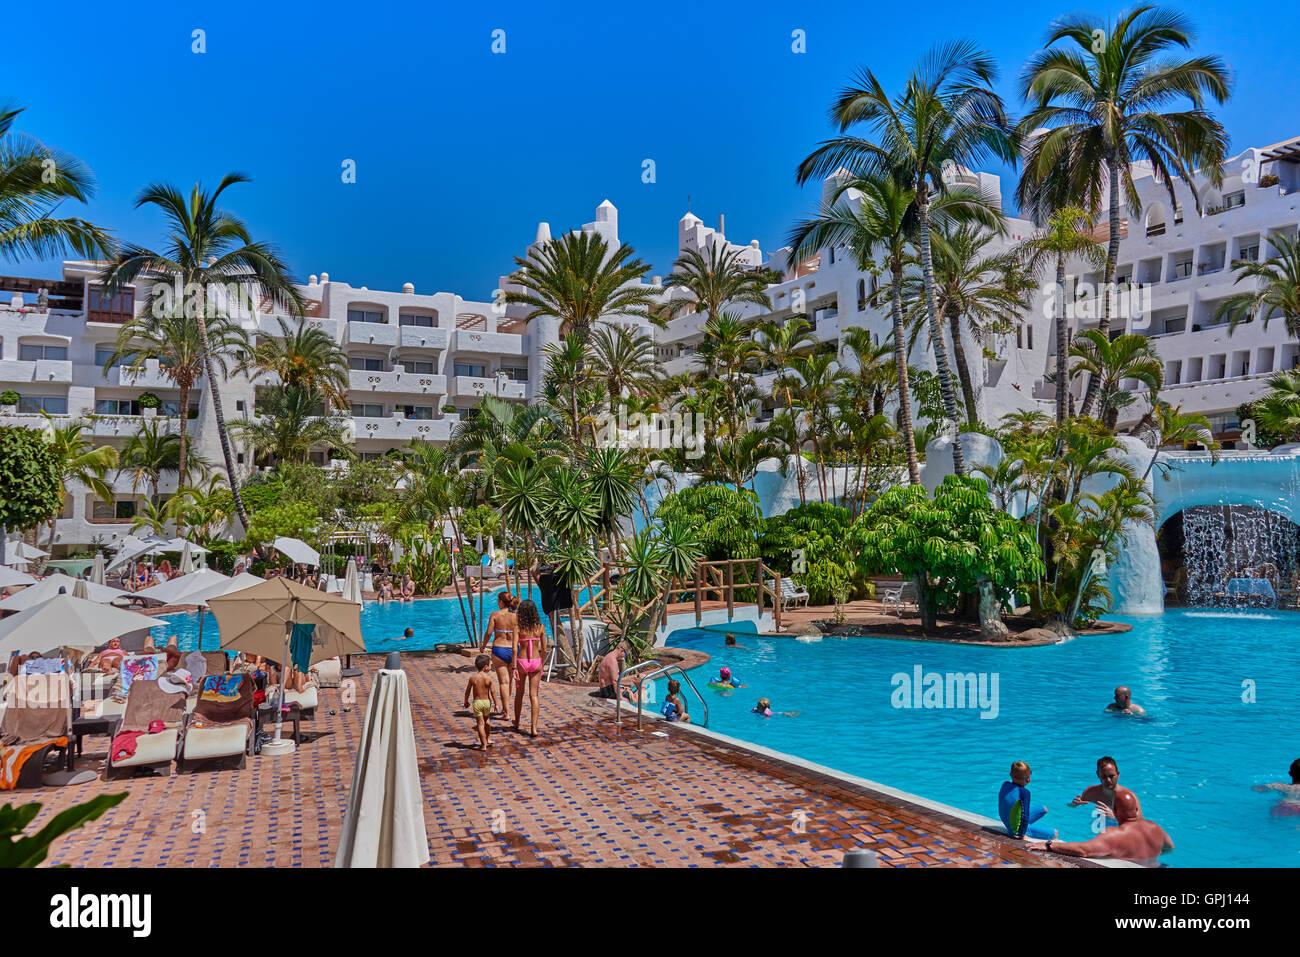 hotel jardin tropical costa adeje tenerife stock photo 117180676 alamy. Black Bedroom Furniture Sets. Home Design Ideas